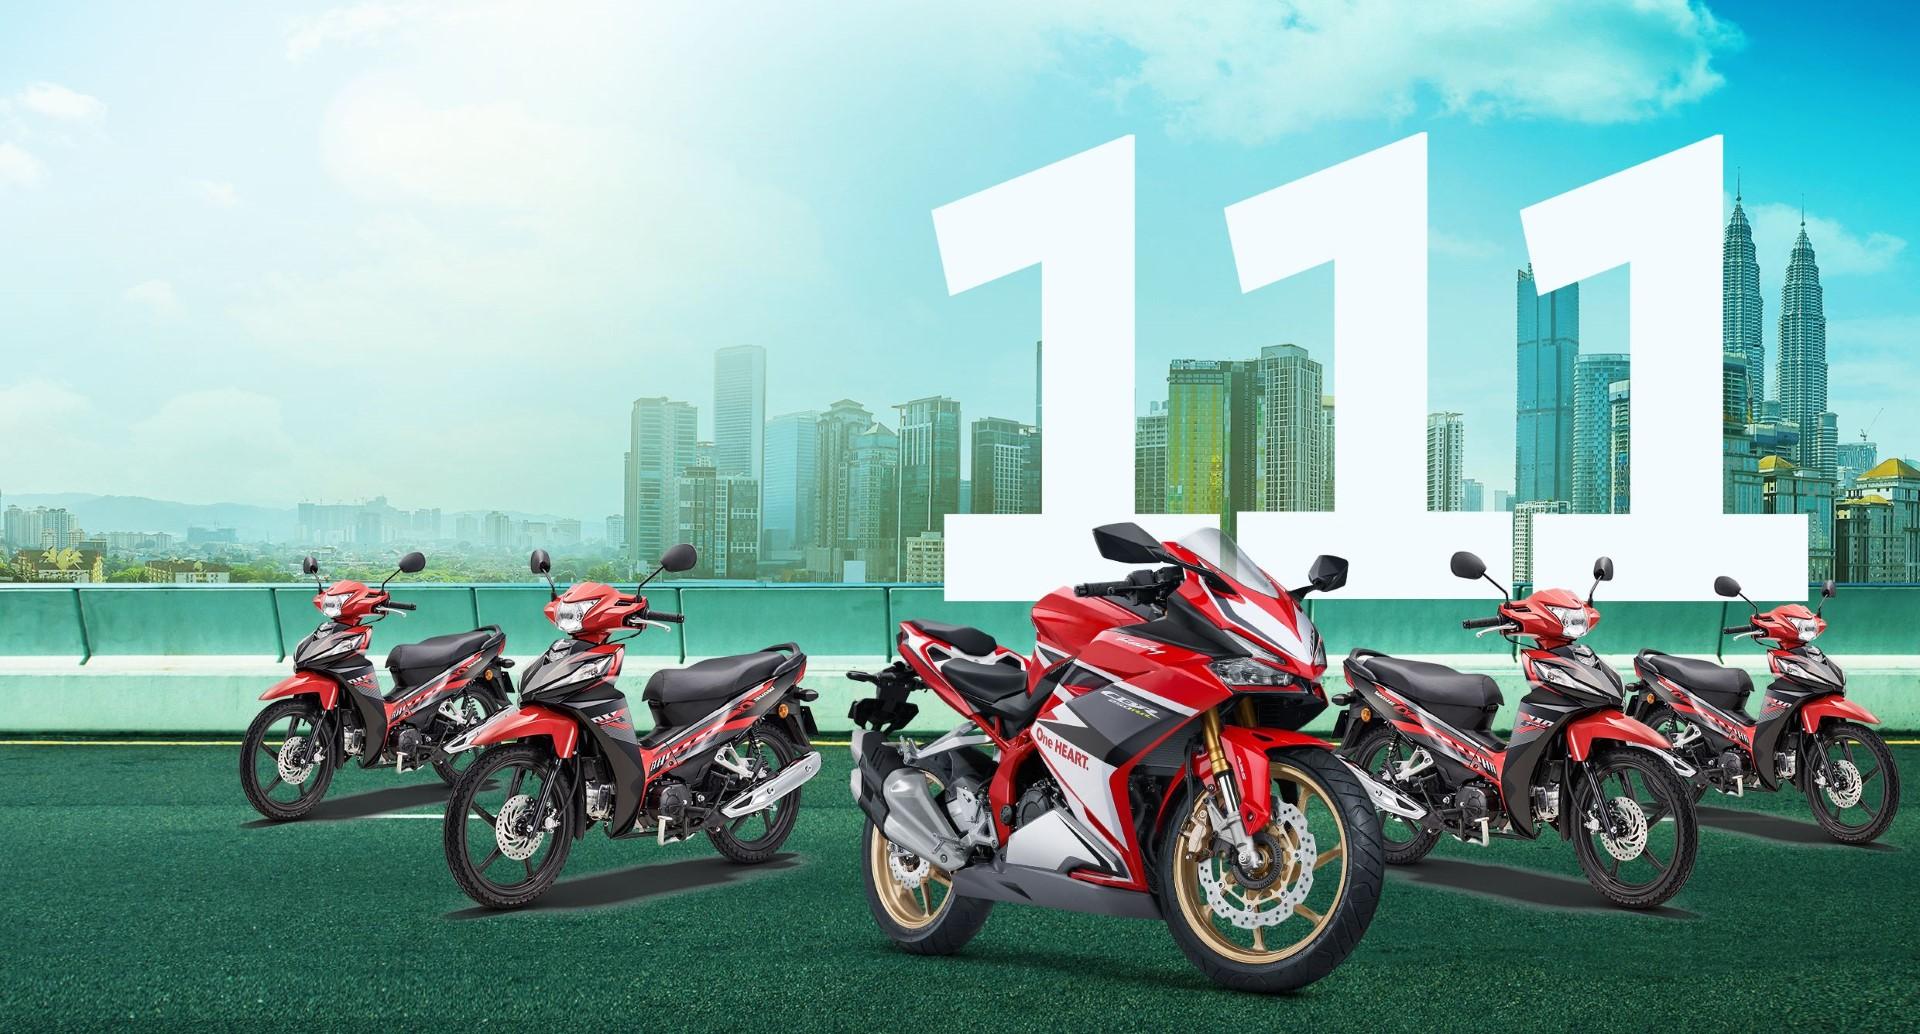 Allianz 111 Motorcycle